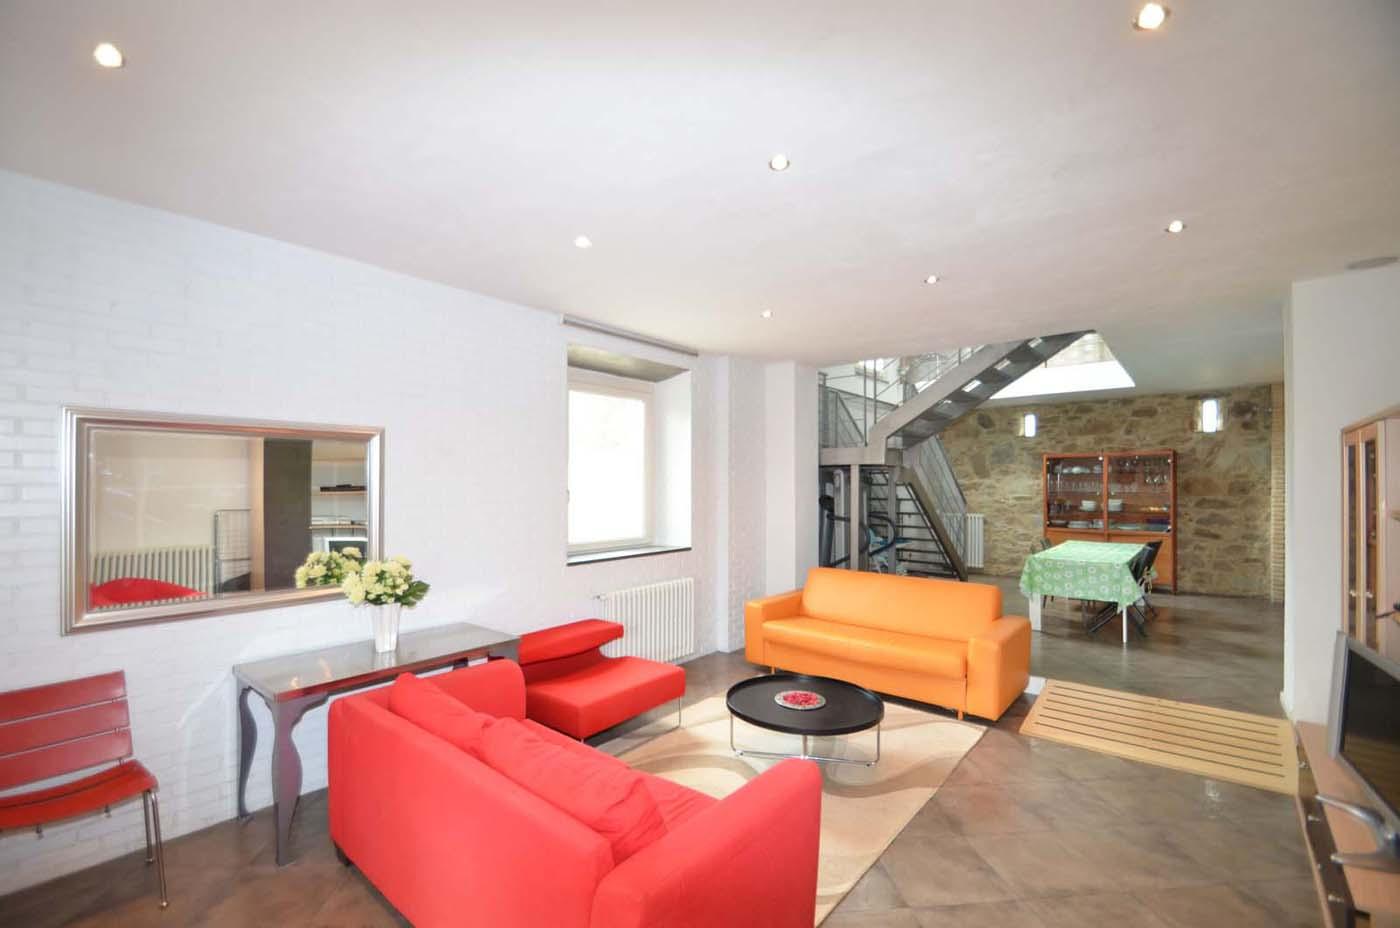 100 Toscana Home Interiors Elegant Toscana In Casa